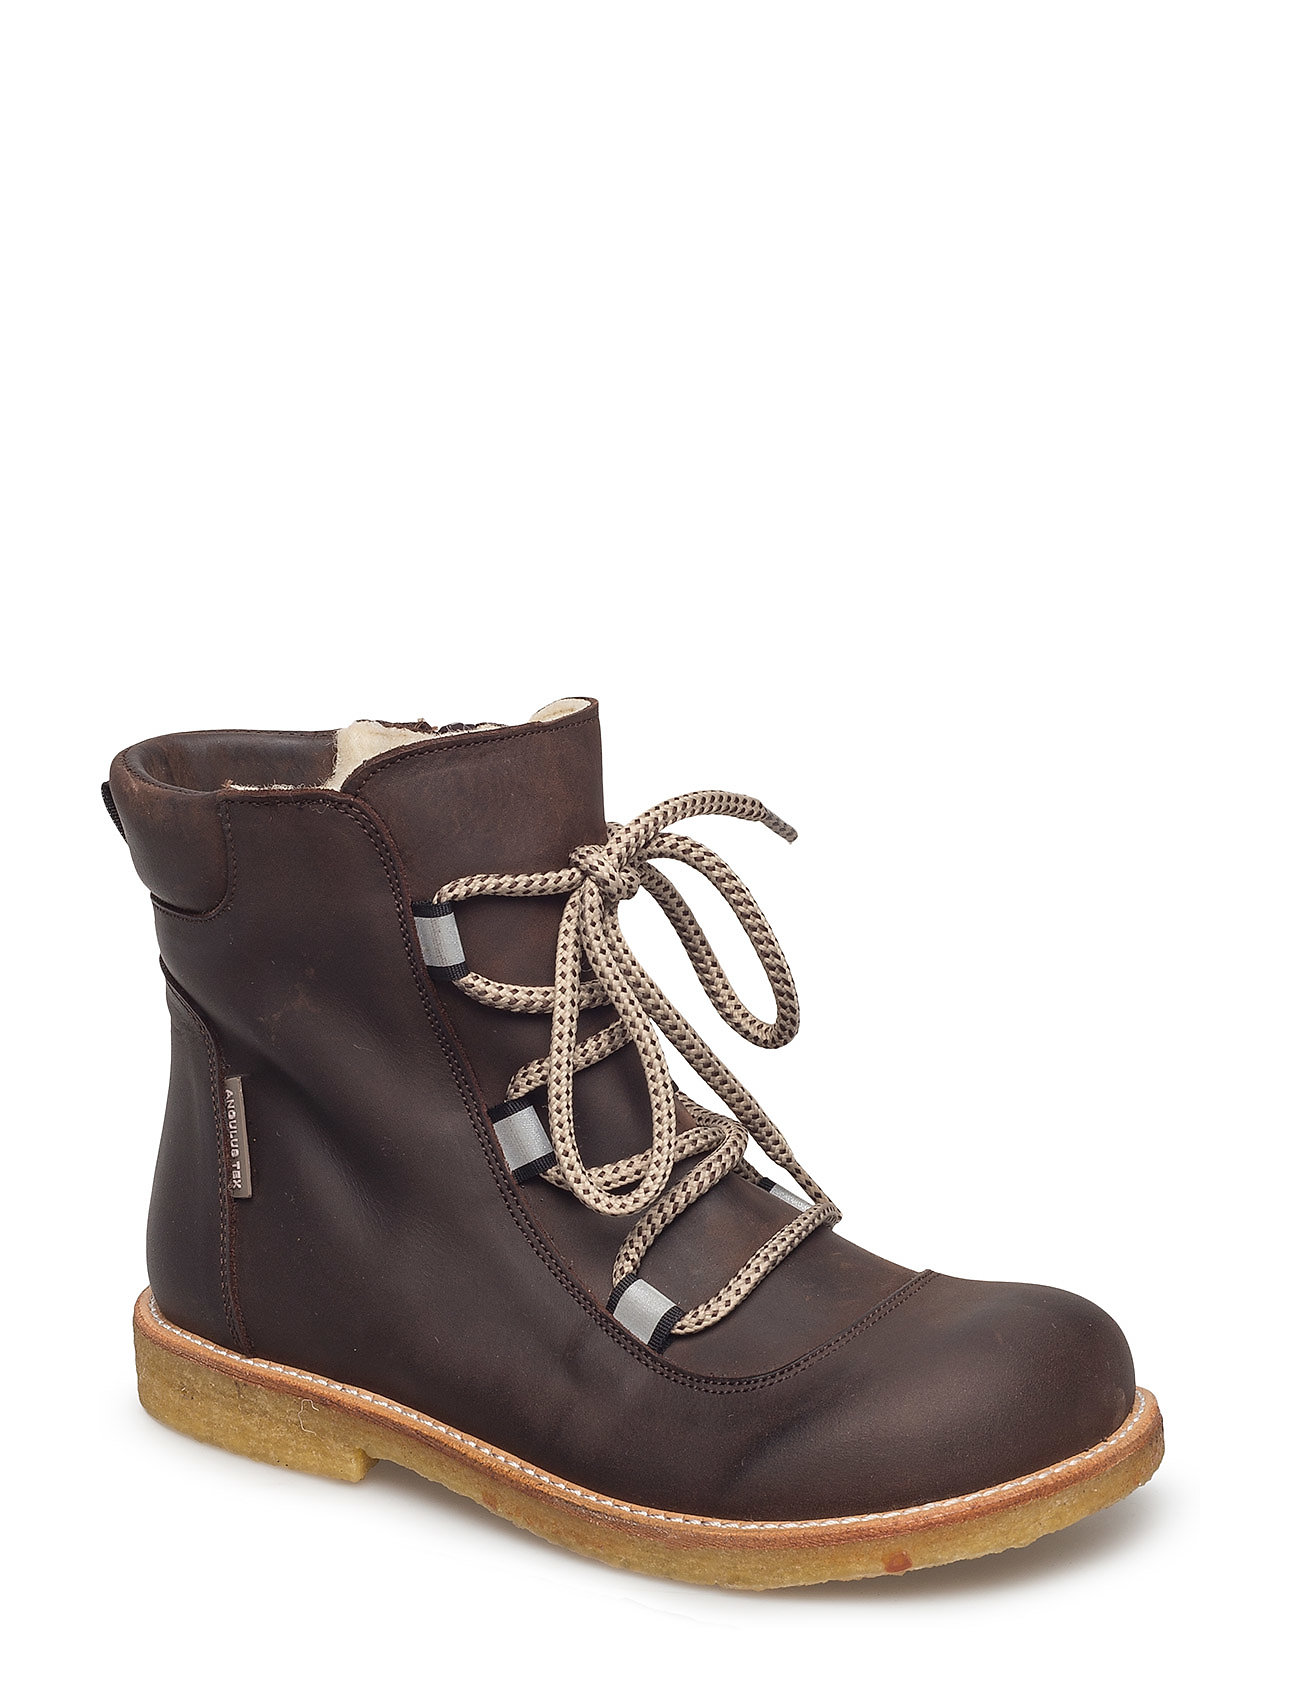 ANGULUS Boots - flat - with velcro - 1660/1660/2022 DARK BROWN/REFL